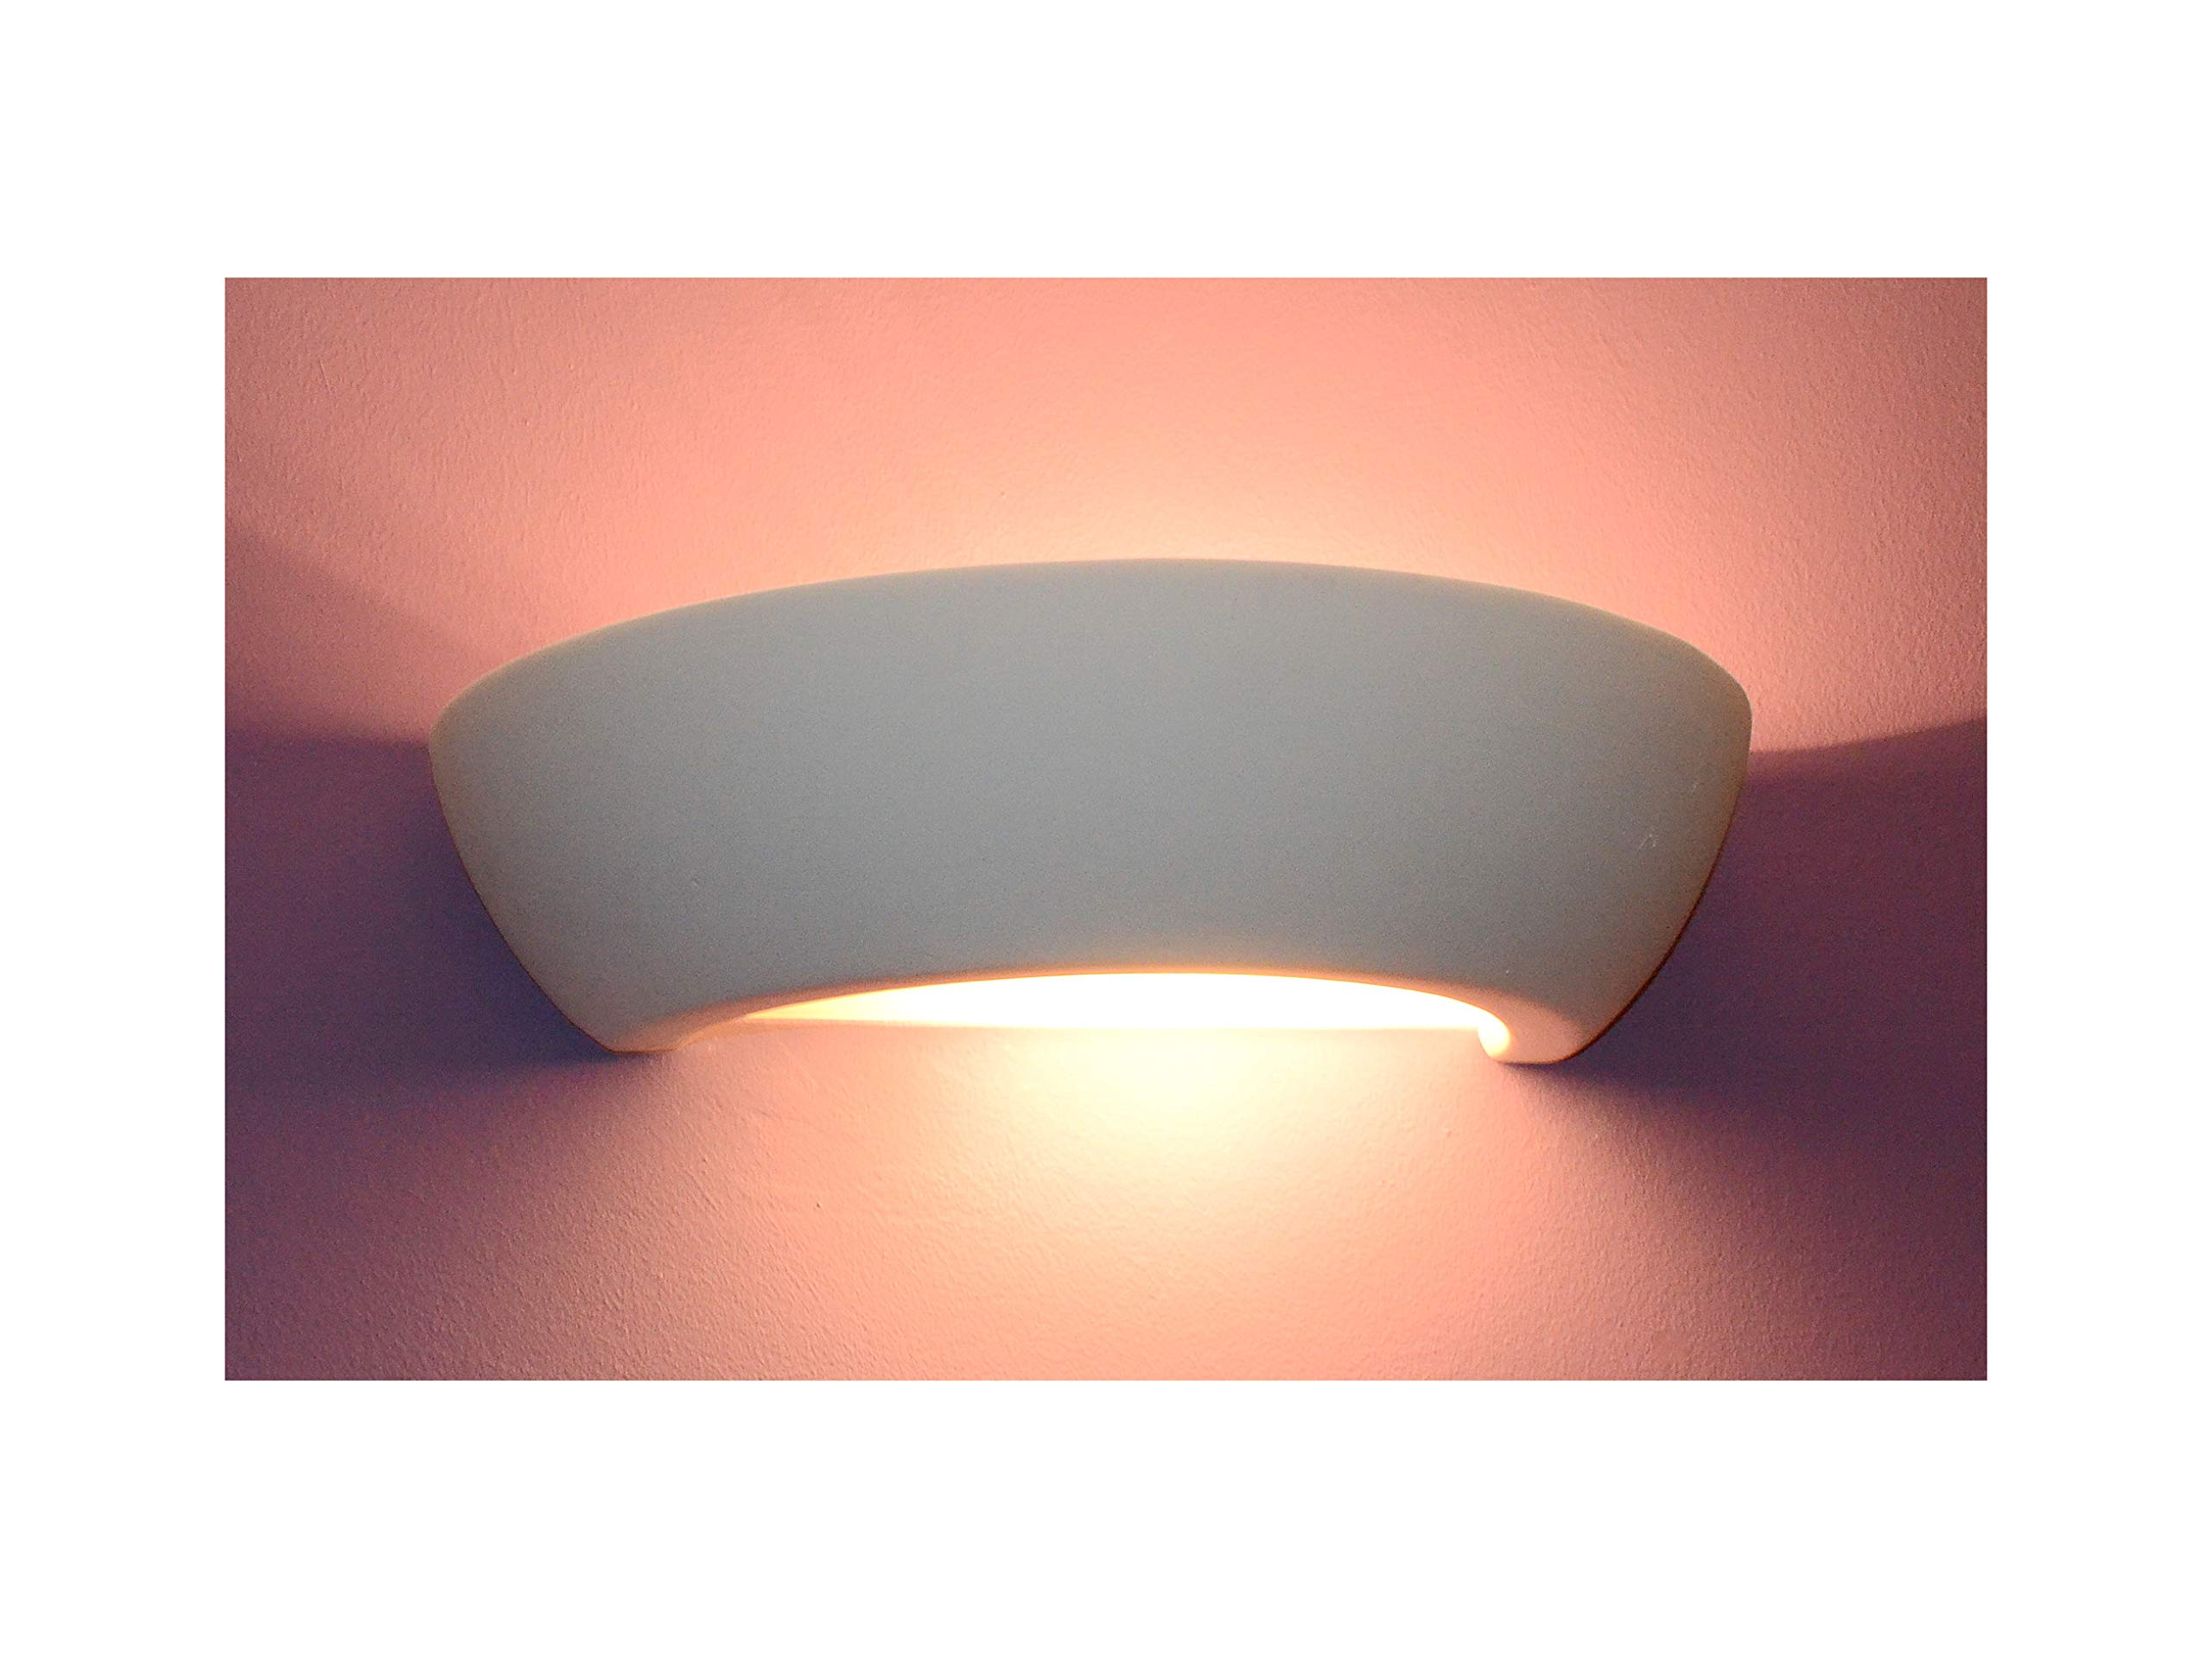 Lampada da parete lampada da parete lampada da parete